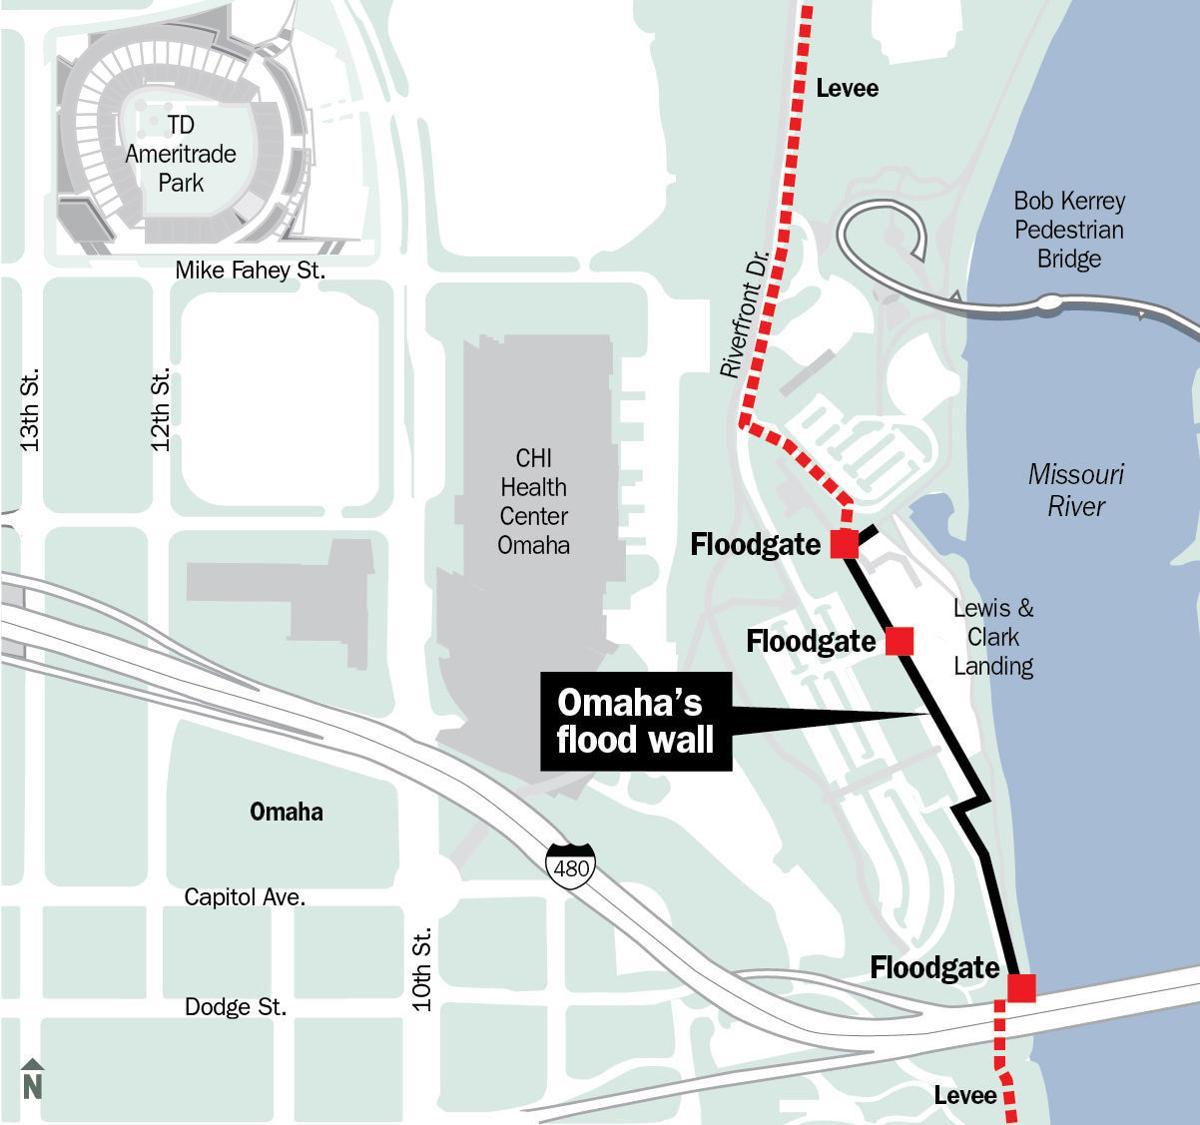 Omaha's 1-mile flood wall